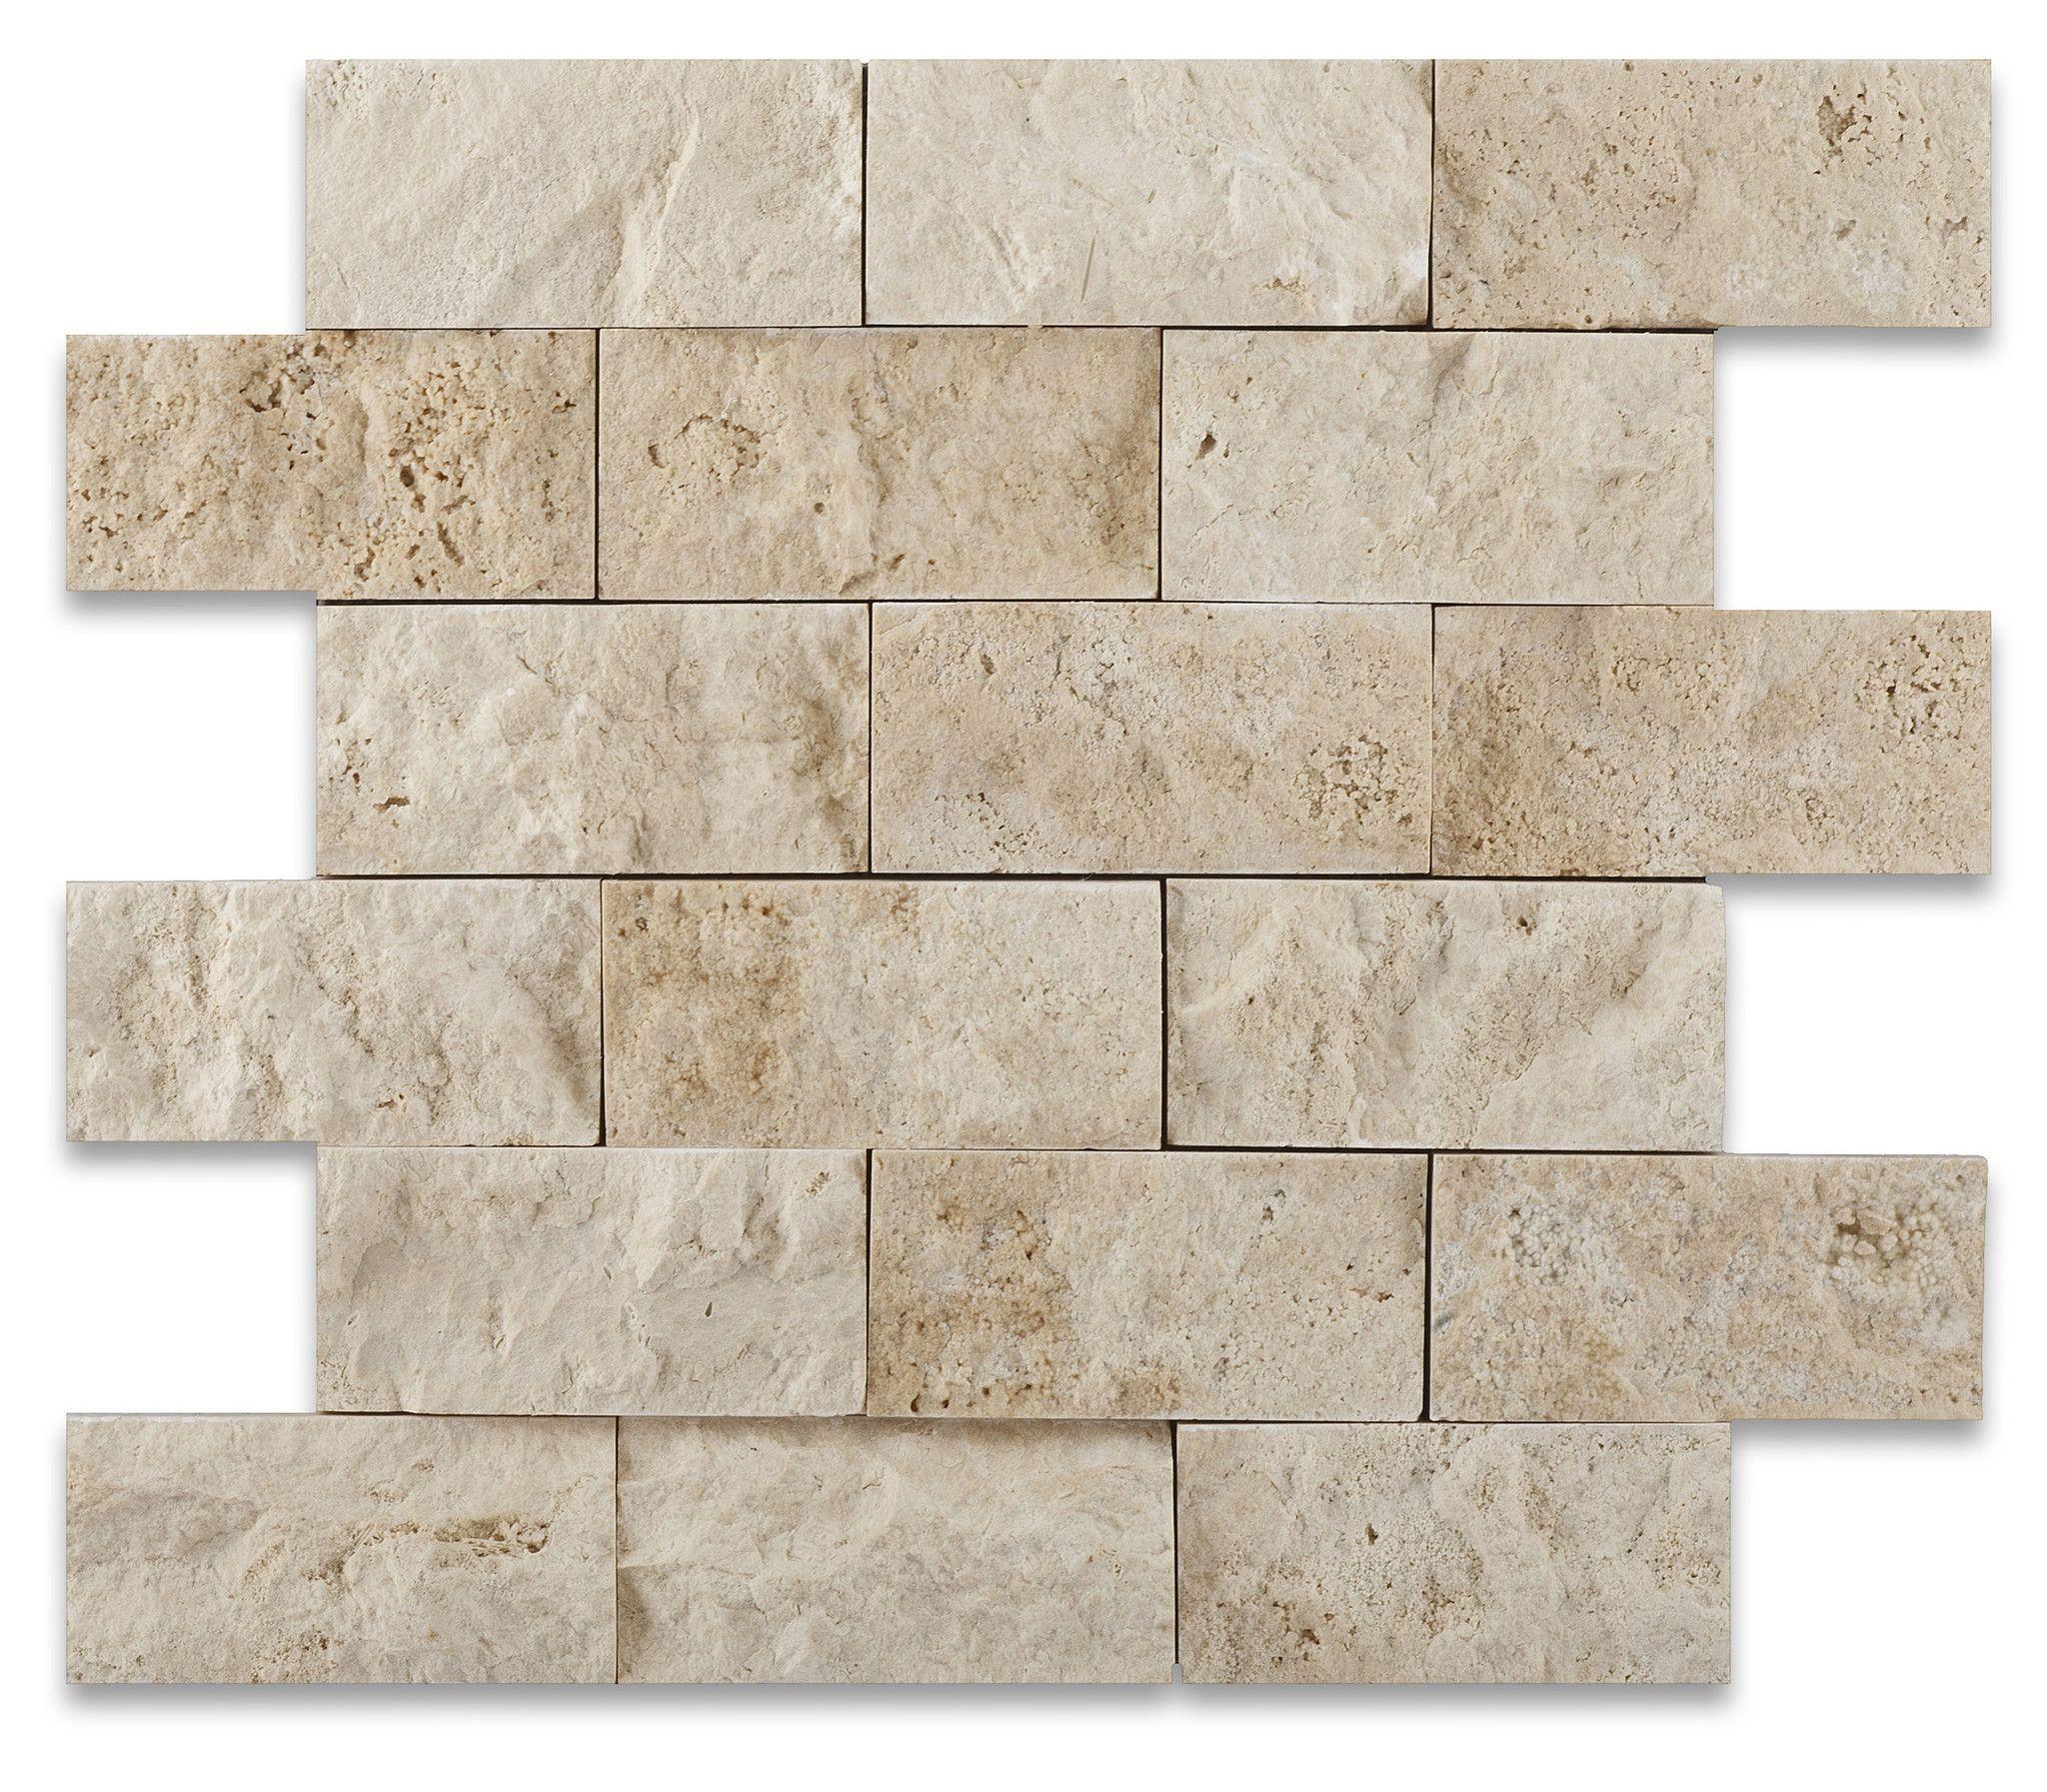 2 X 4 Ivory Travertine Split-Faced Brick Mosaic Tile